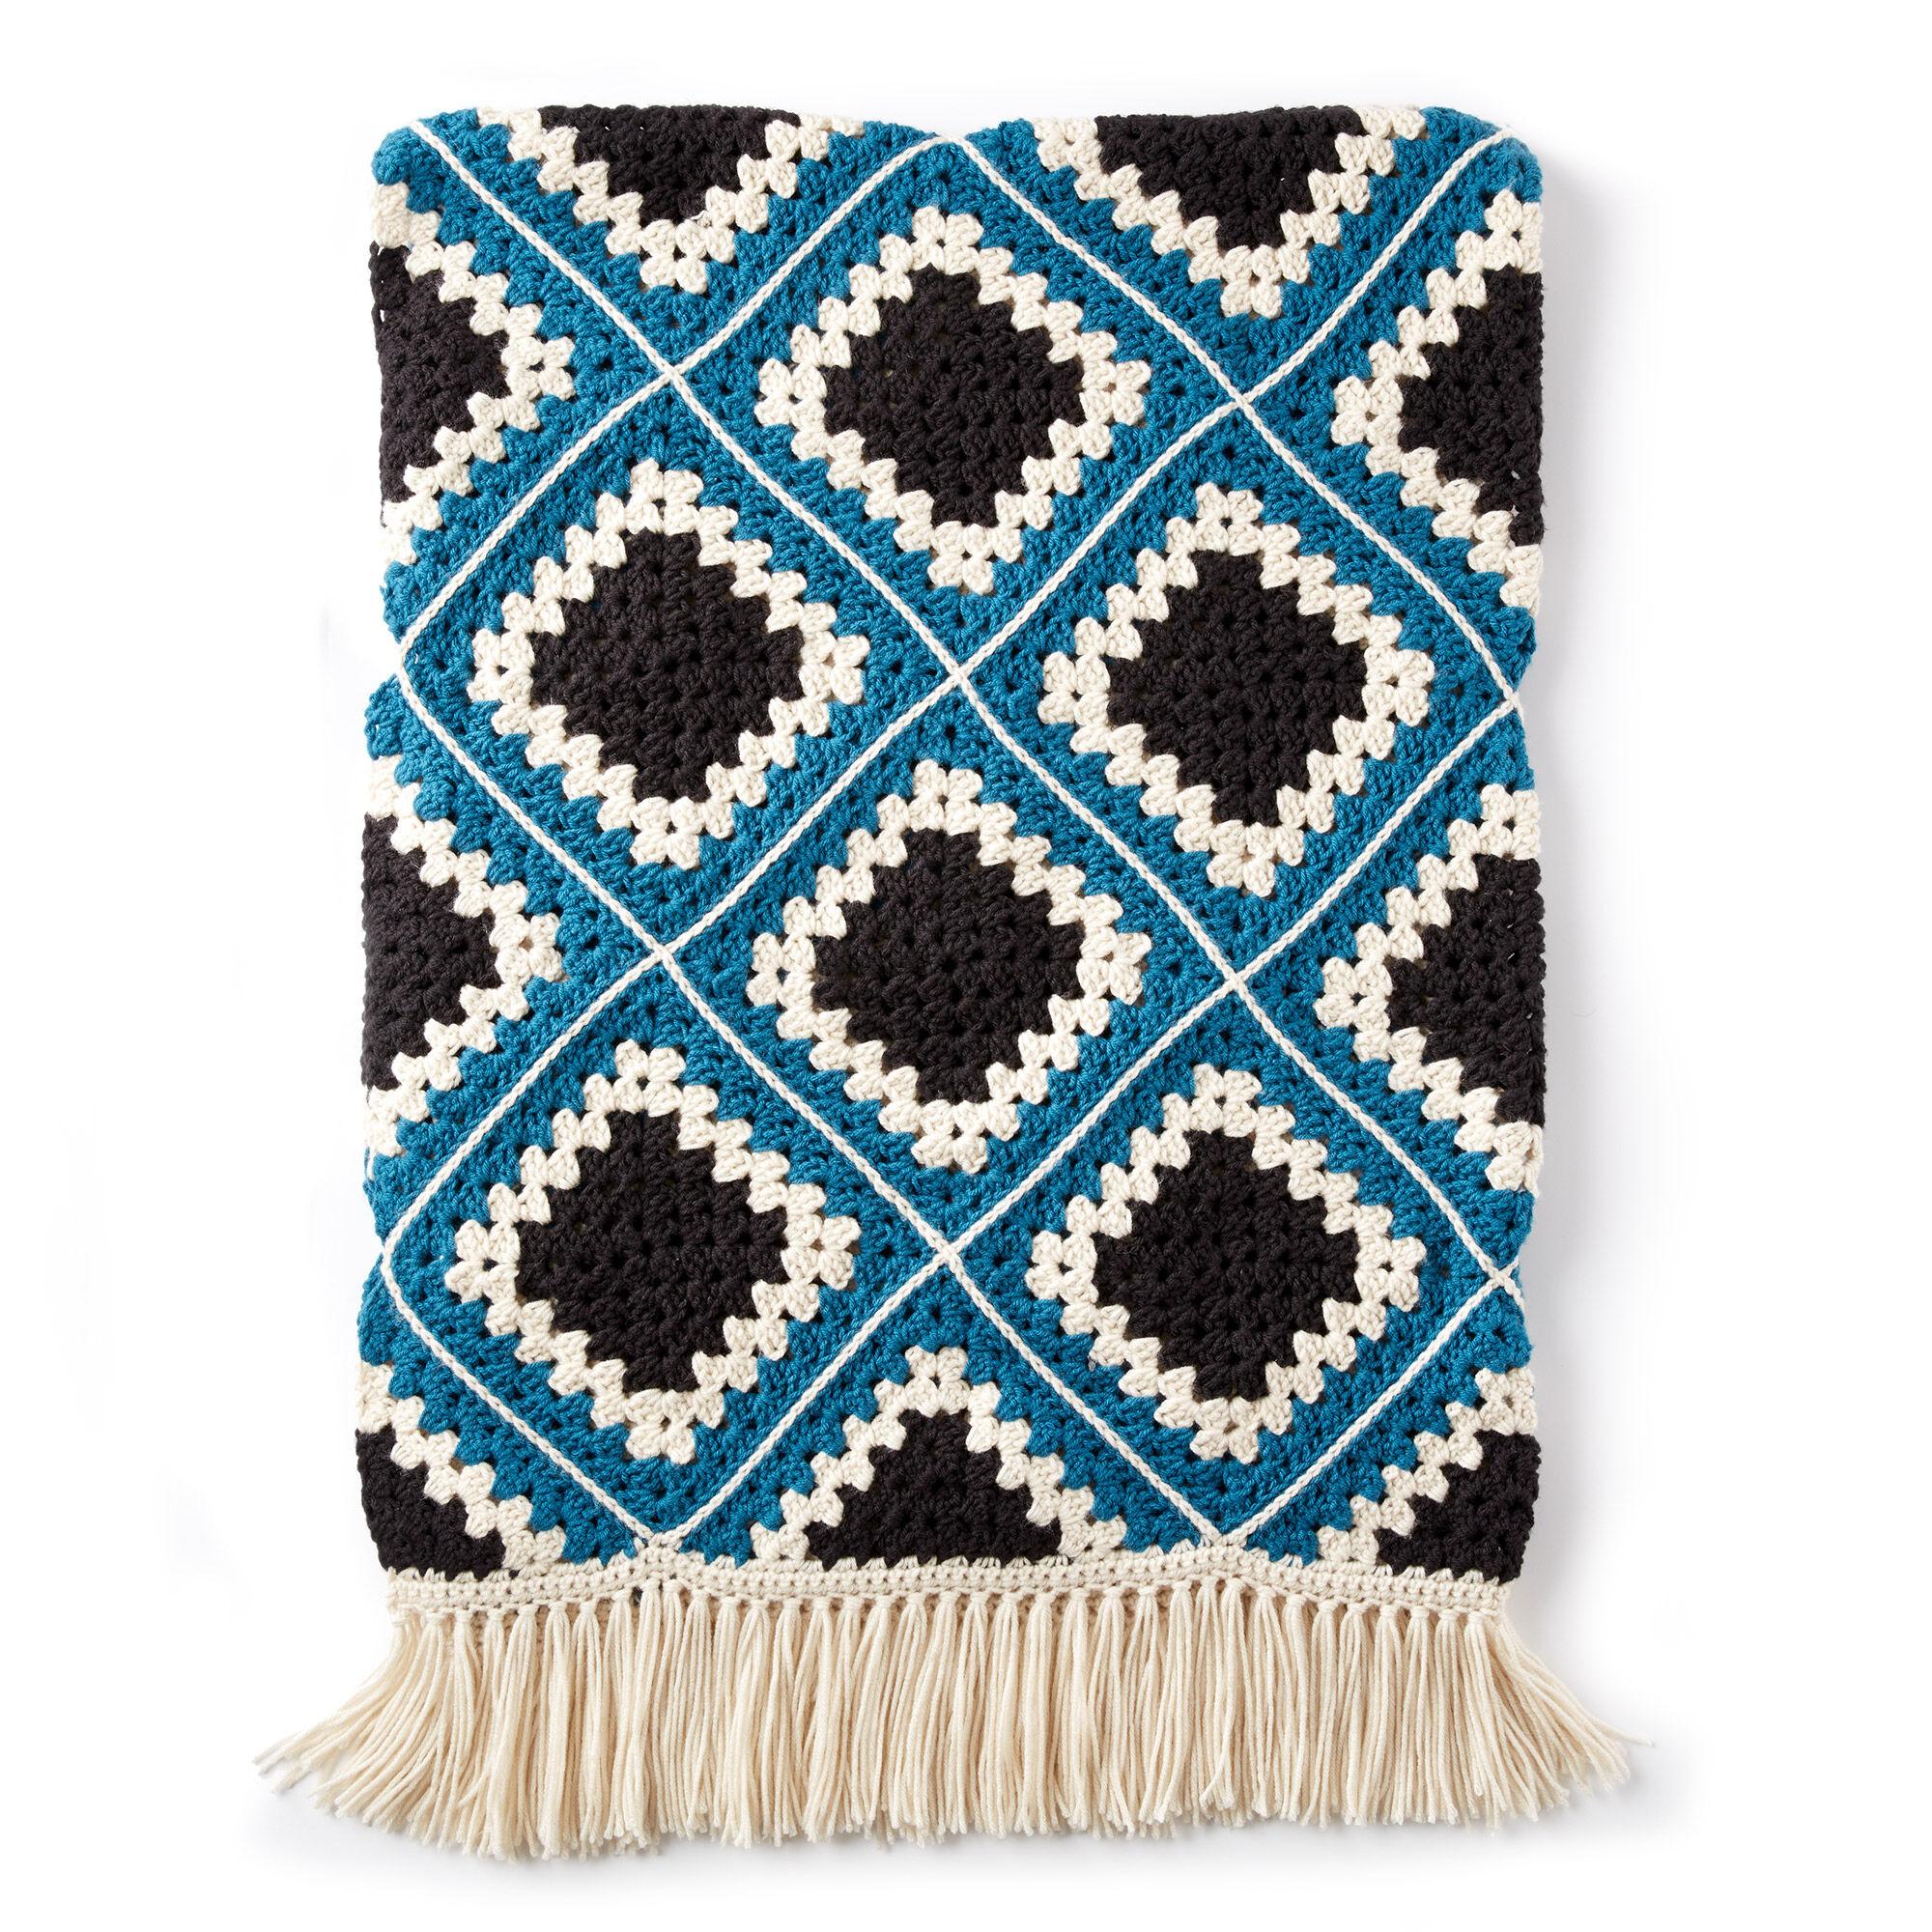 Squared Diamond Granny Throw Free Crochet Pattern